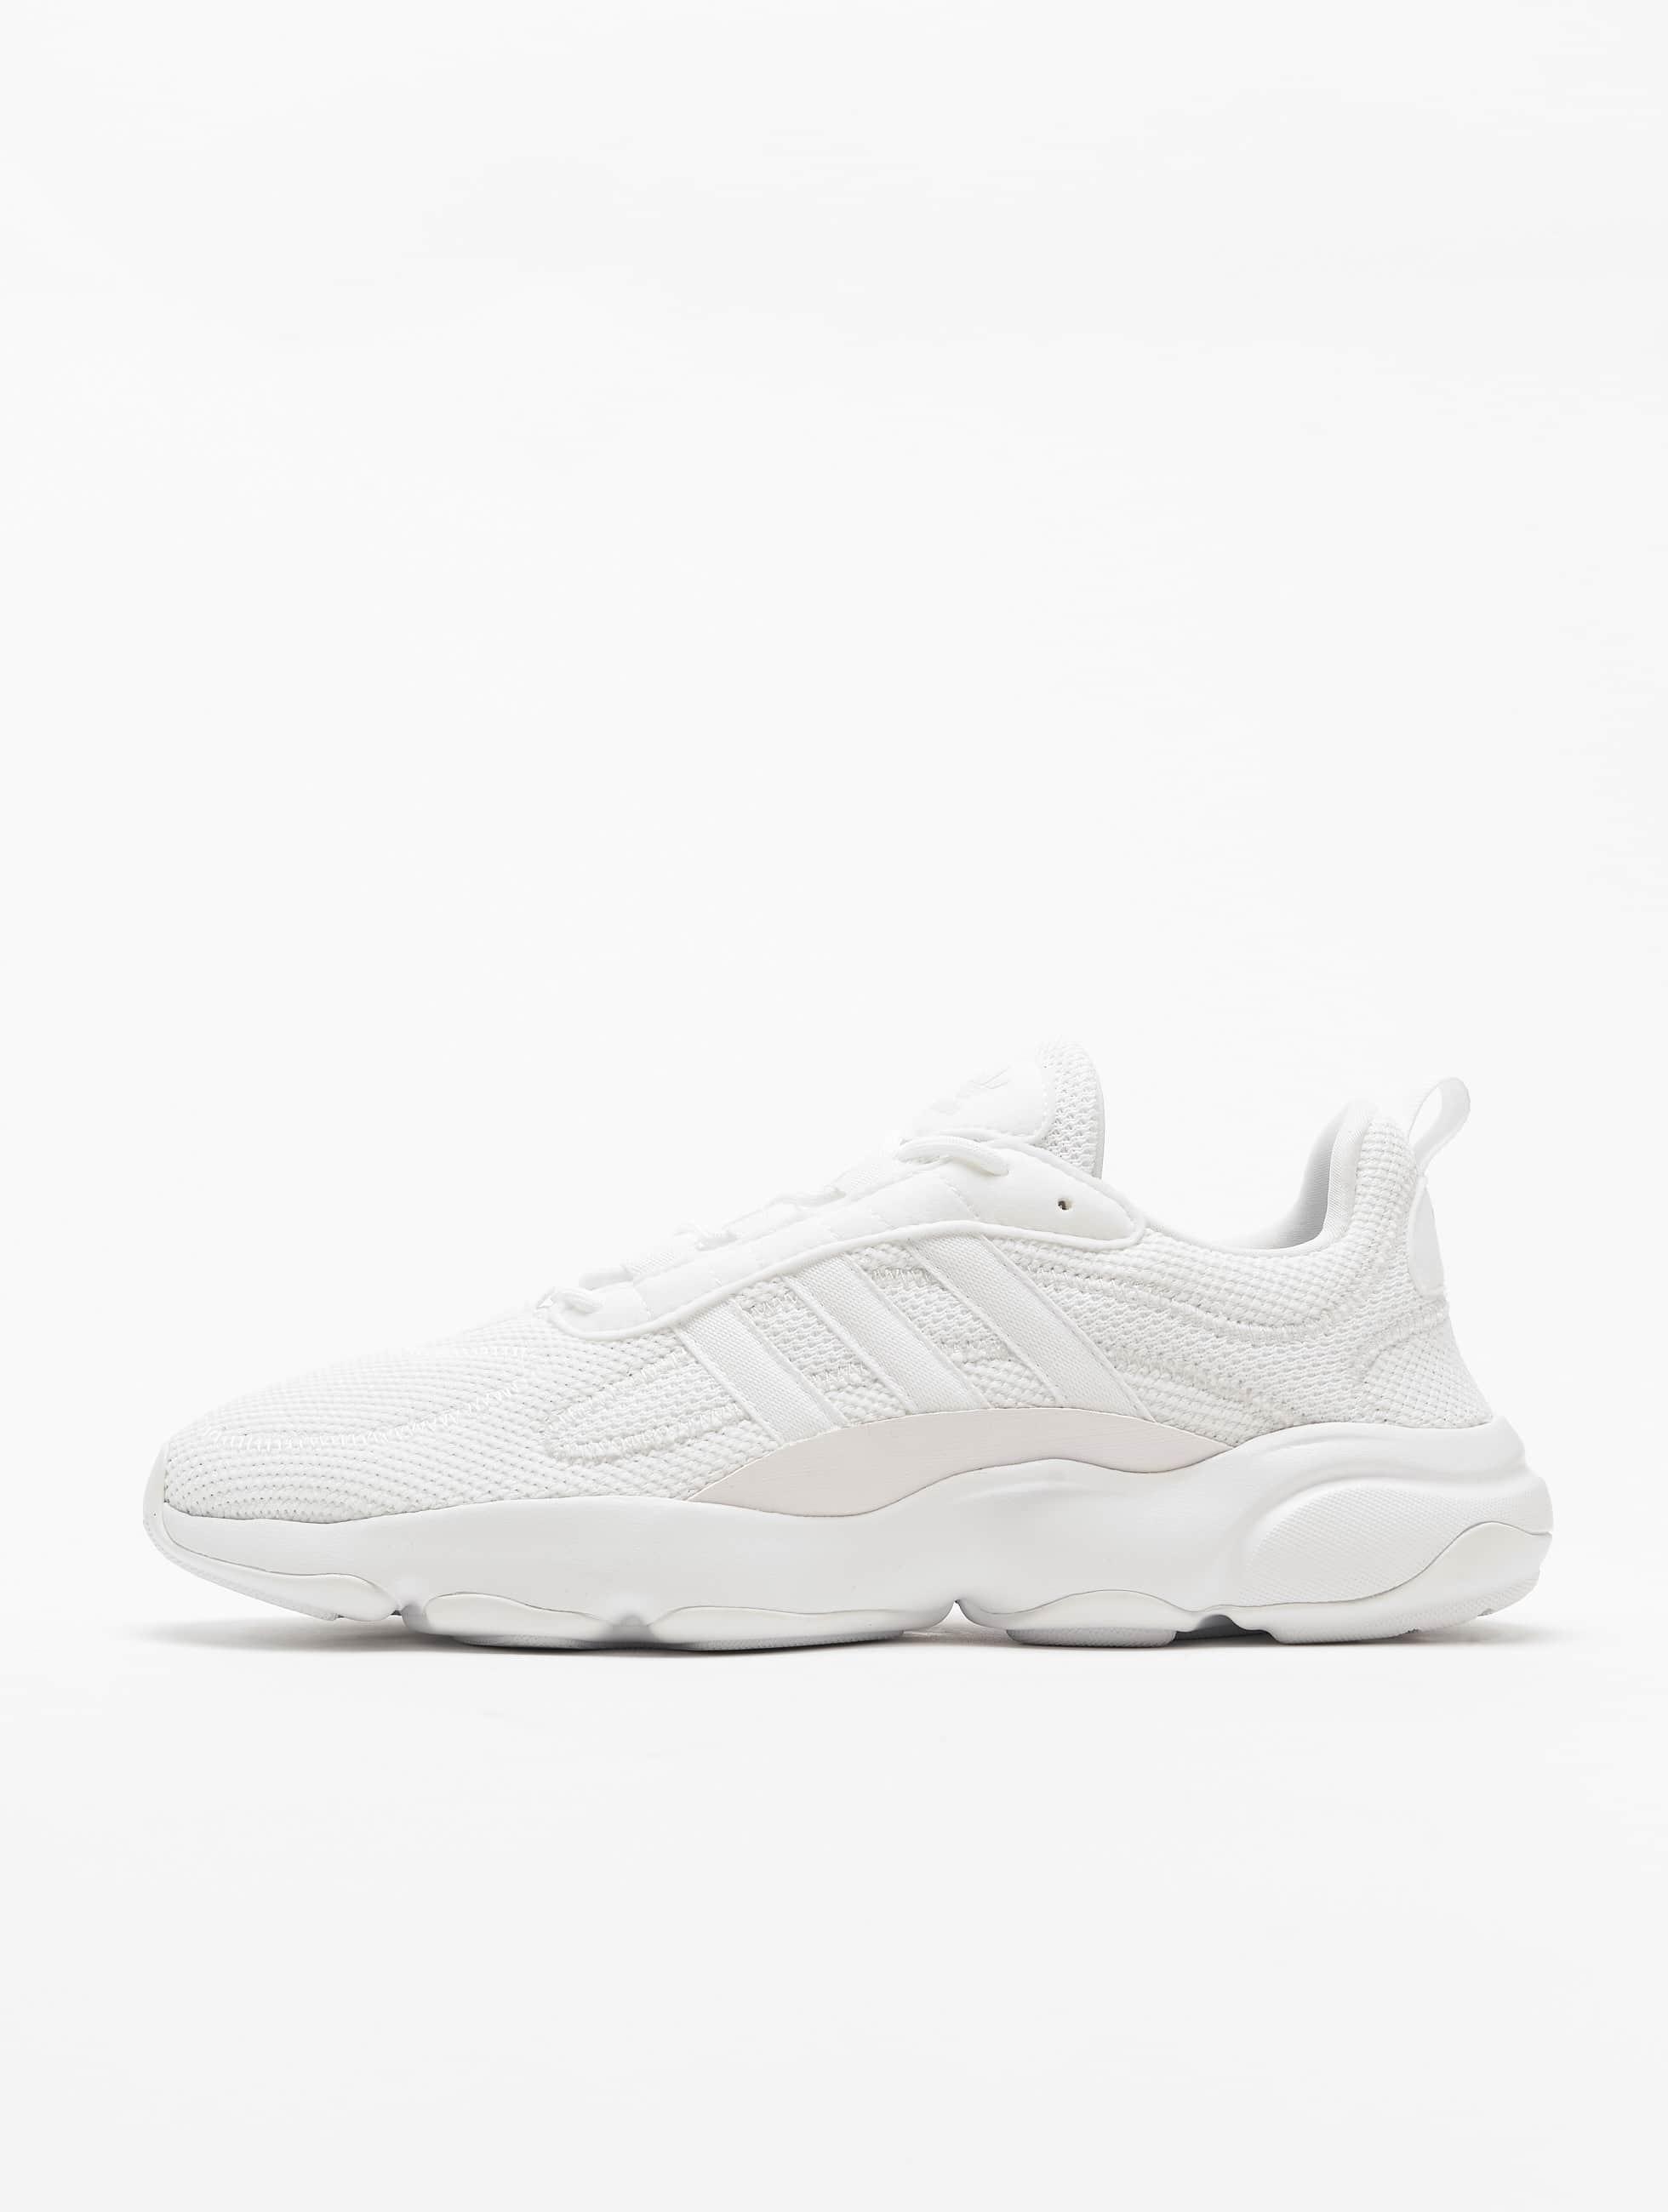 Adidas Originals Haiwee Sneakers Ftwr WhiteCore BlackGrey One F17